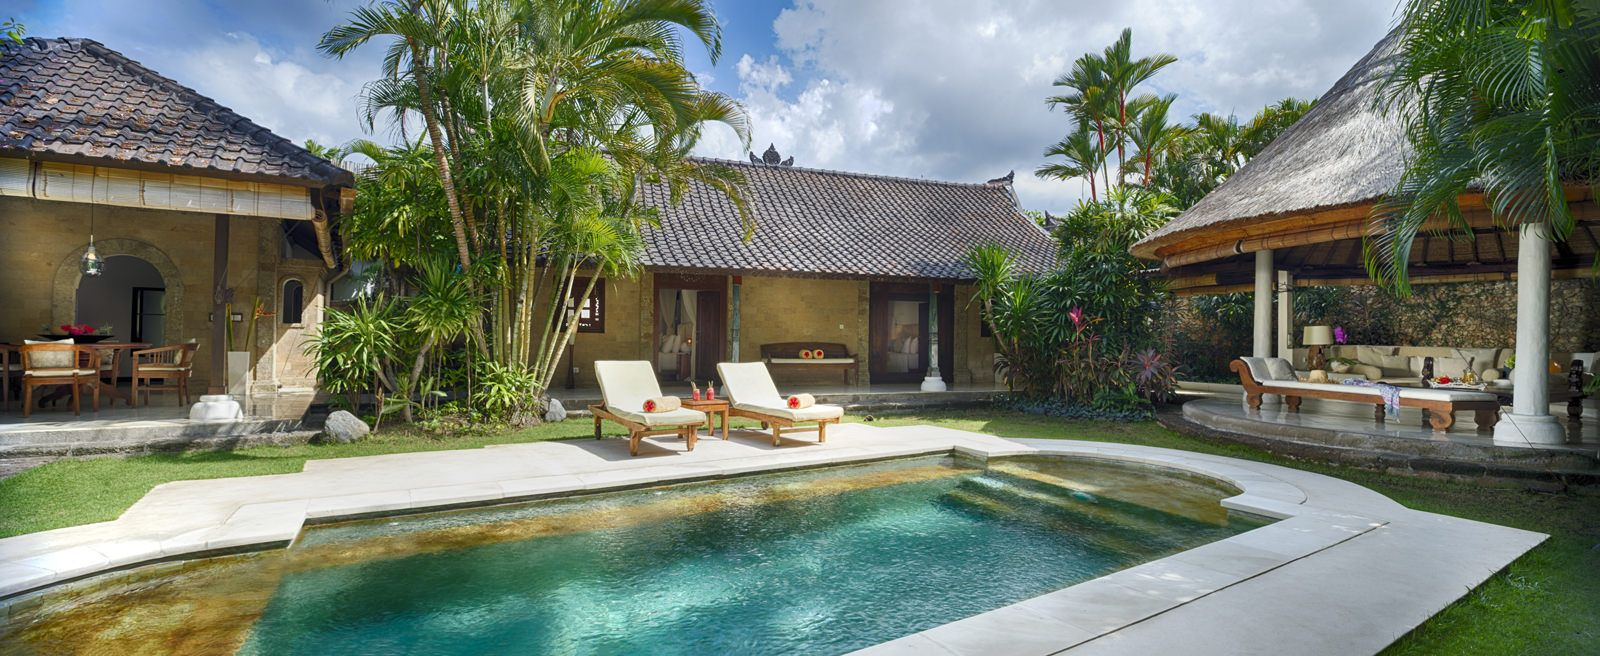 Villa 2 Pool At Villa Kubu Seminyak Bali Villa With Private Pool Outdoor Lounge Area Private Pool